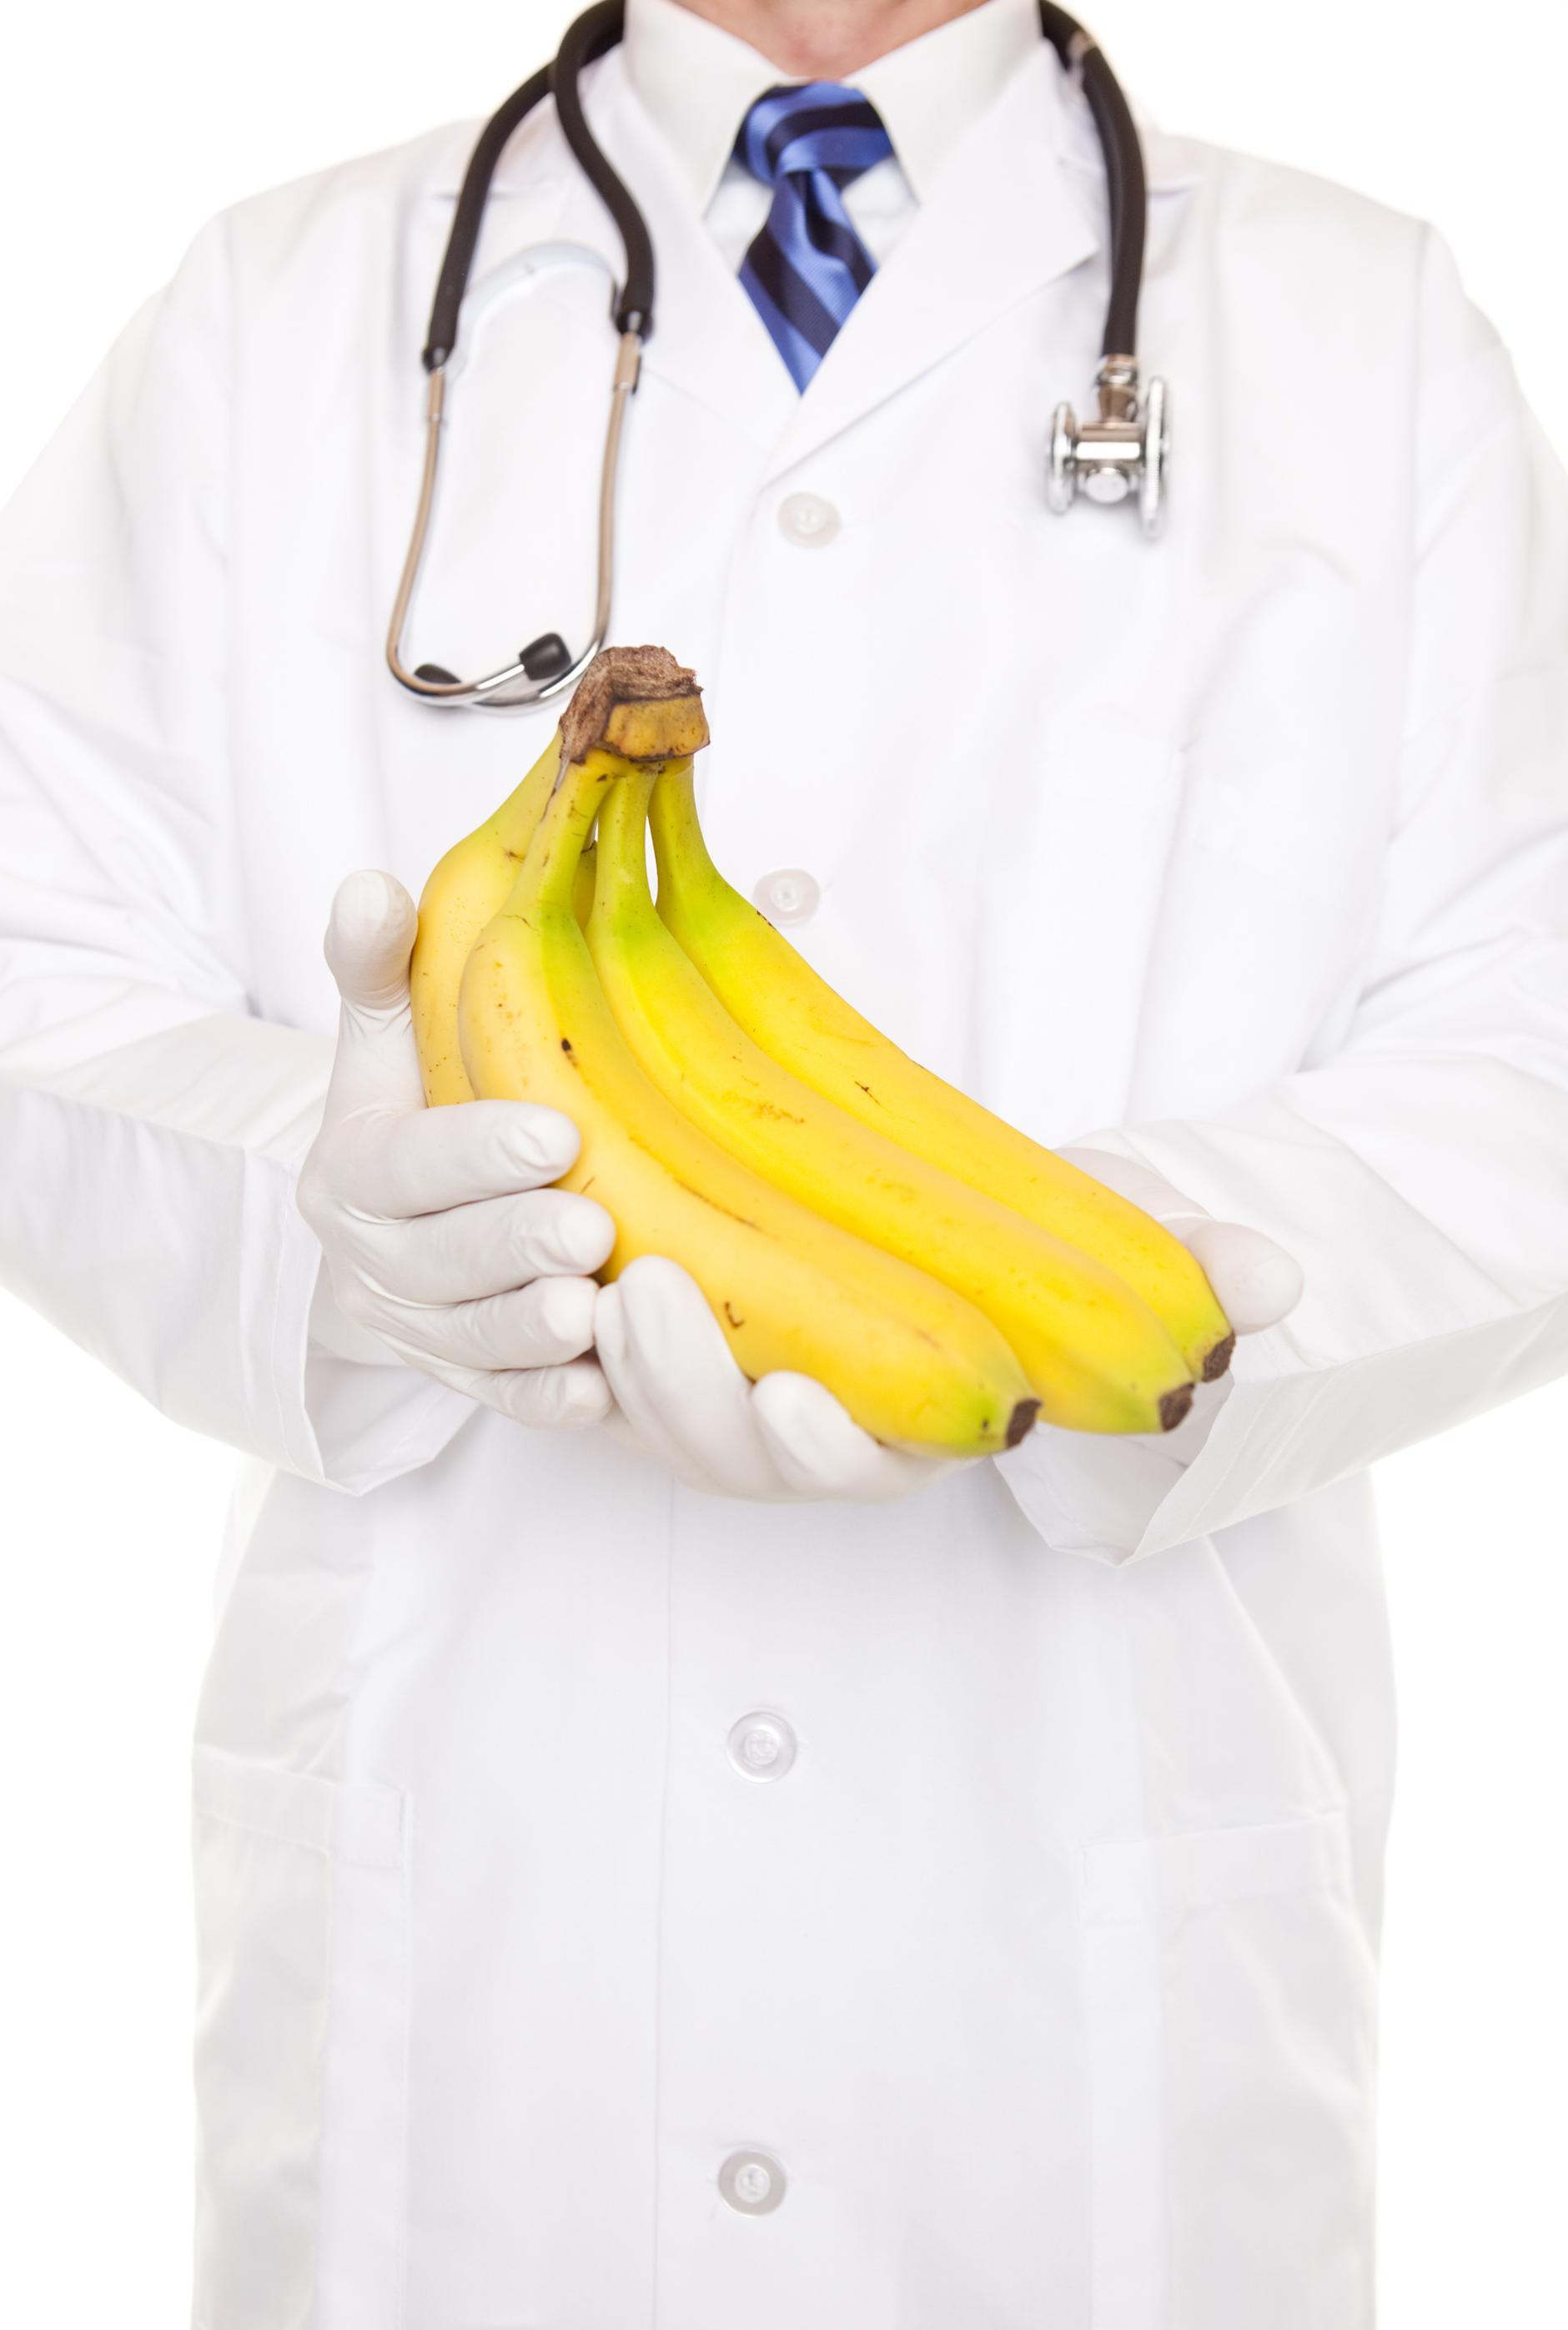 Banana doctor